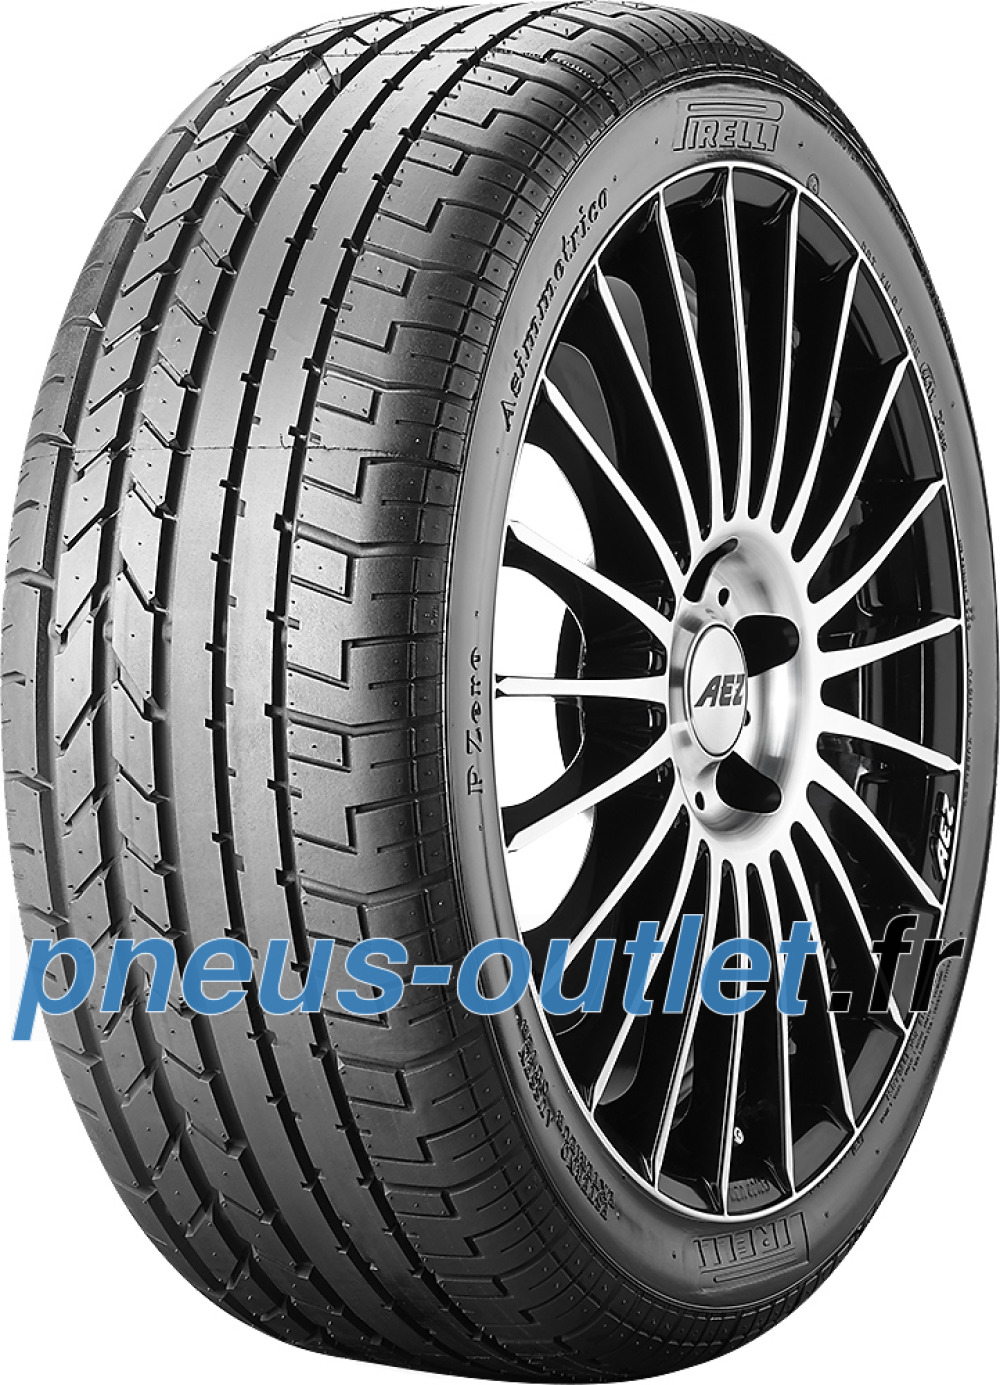 Pirelli P Zero Asimmetrico ( 335/30 ZR18 102Y )